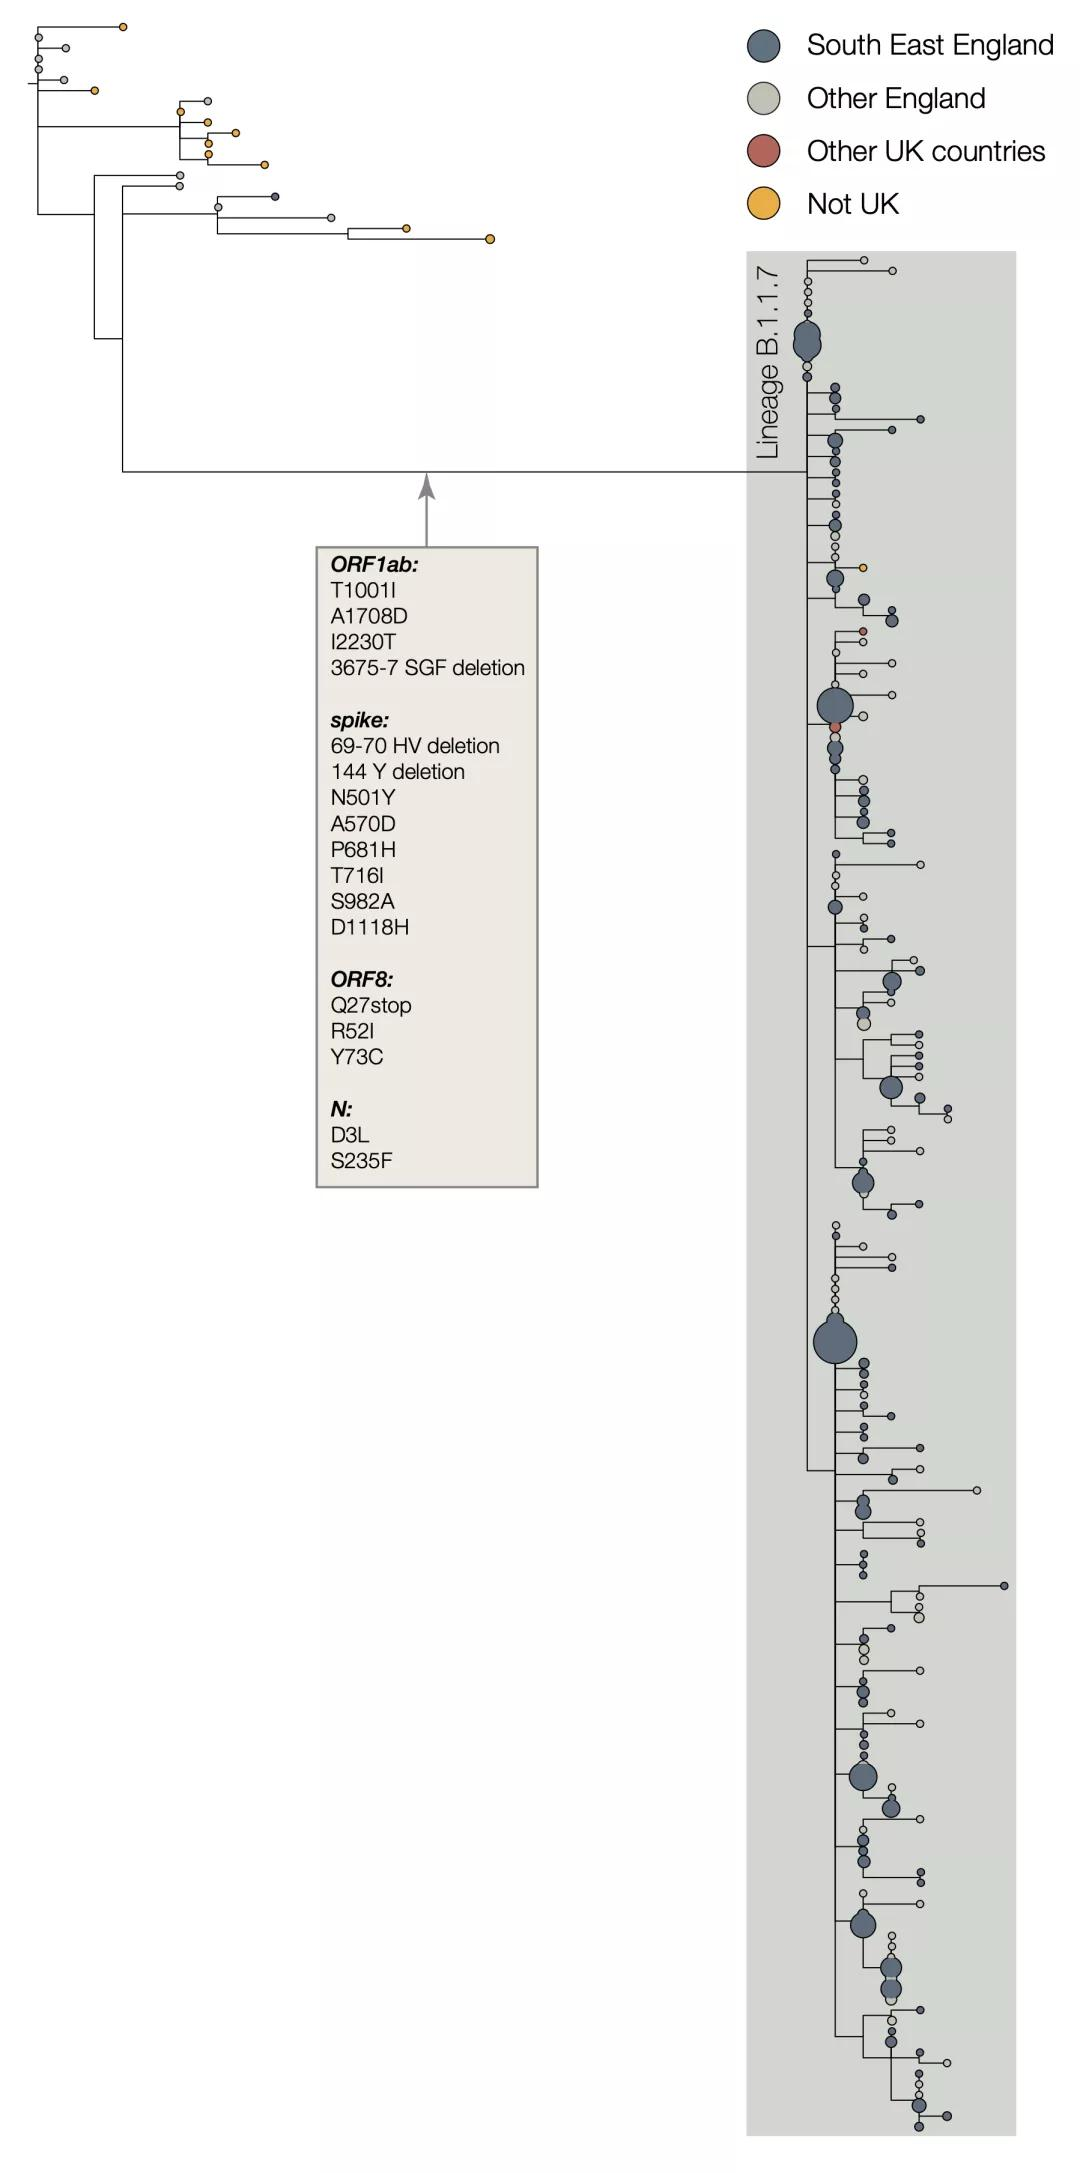 B.1.1.7谱系的系统发育树及突变位点